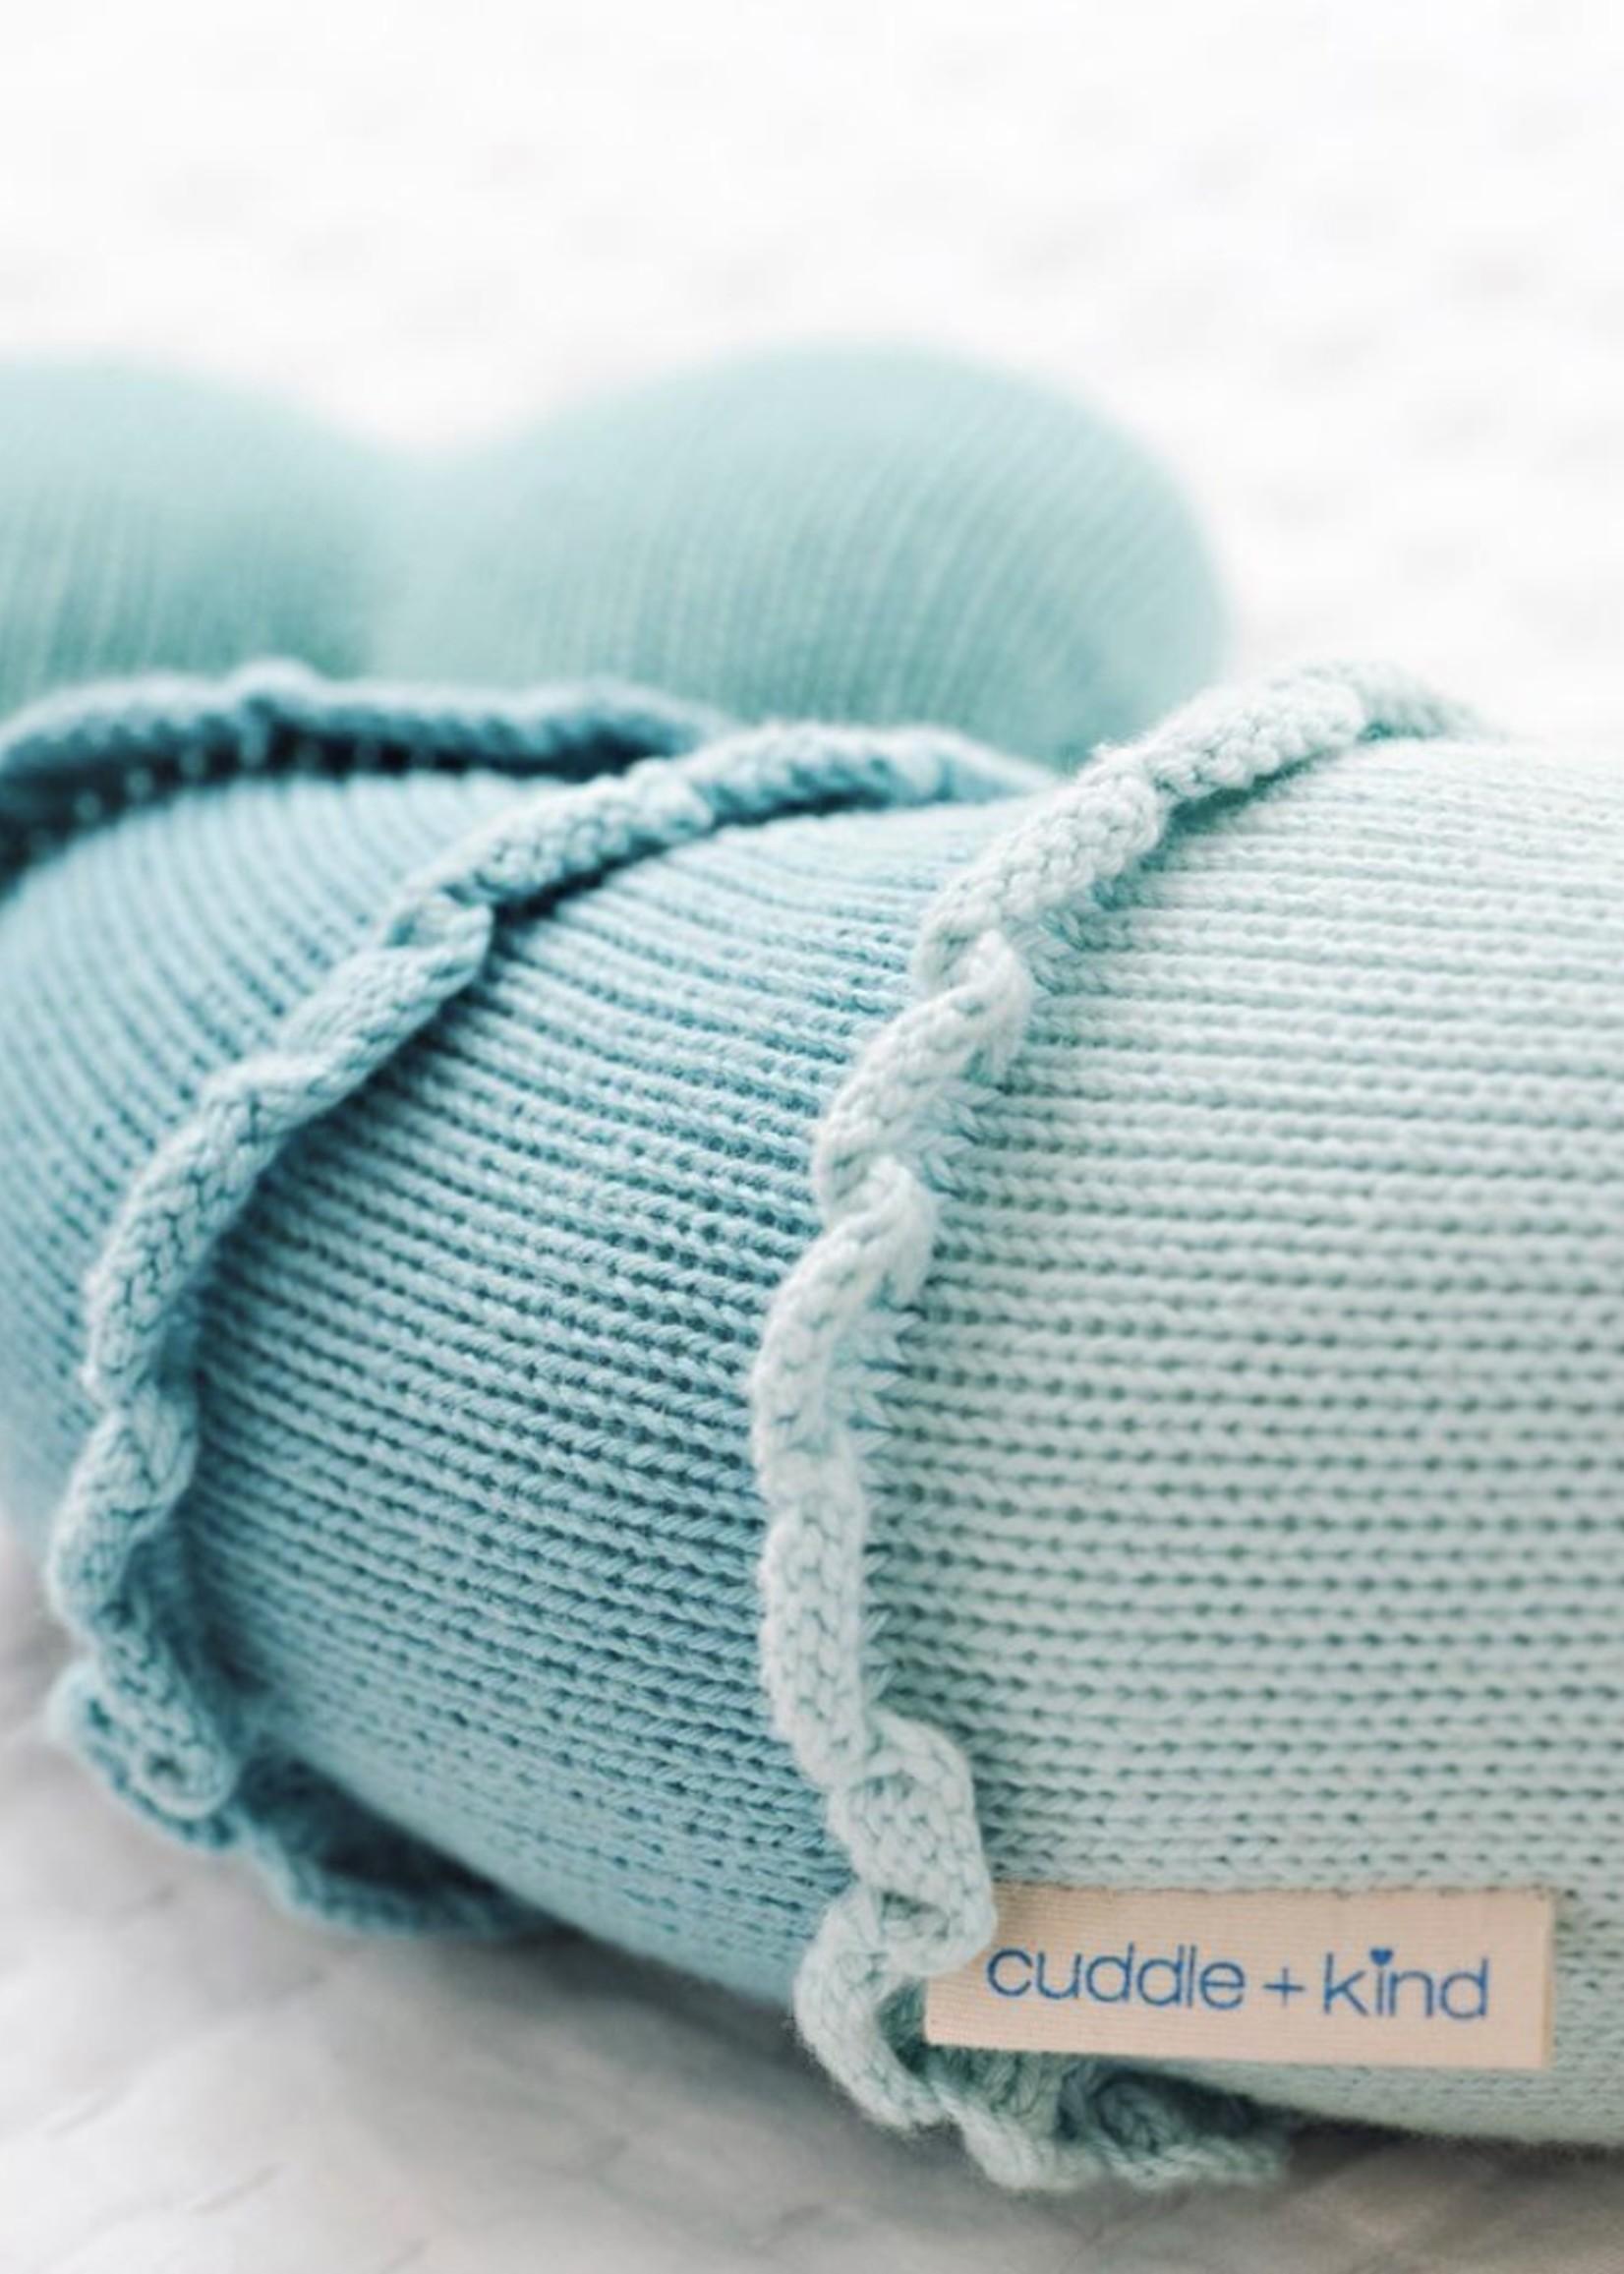 cuddle + kind Mini Mermaid Knit Doll SKYE